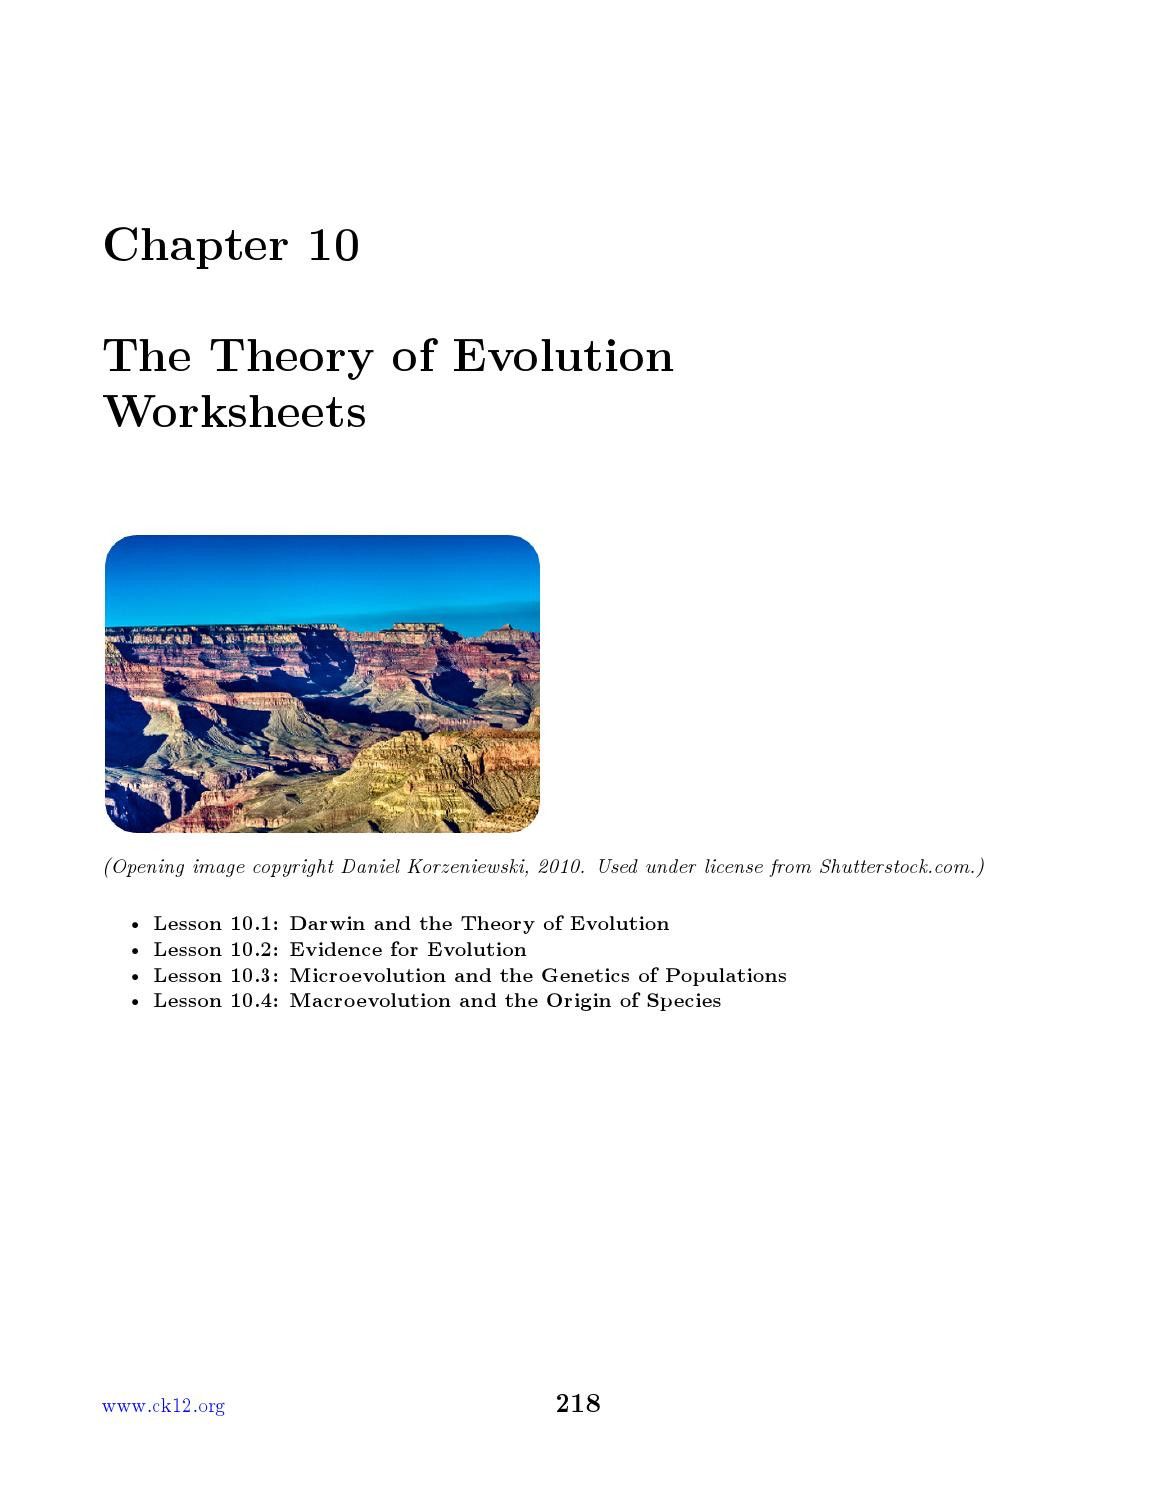 30 Evidence for Evolution Worksheet Answers | Education ...